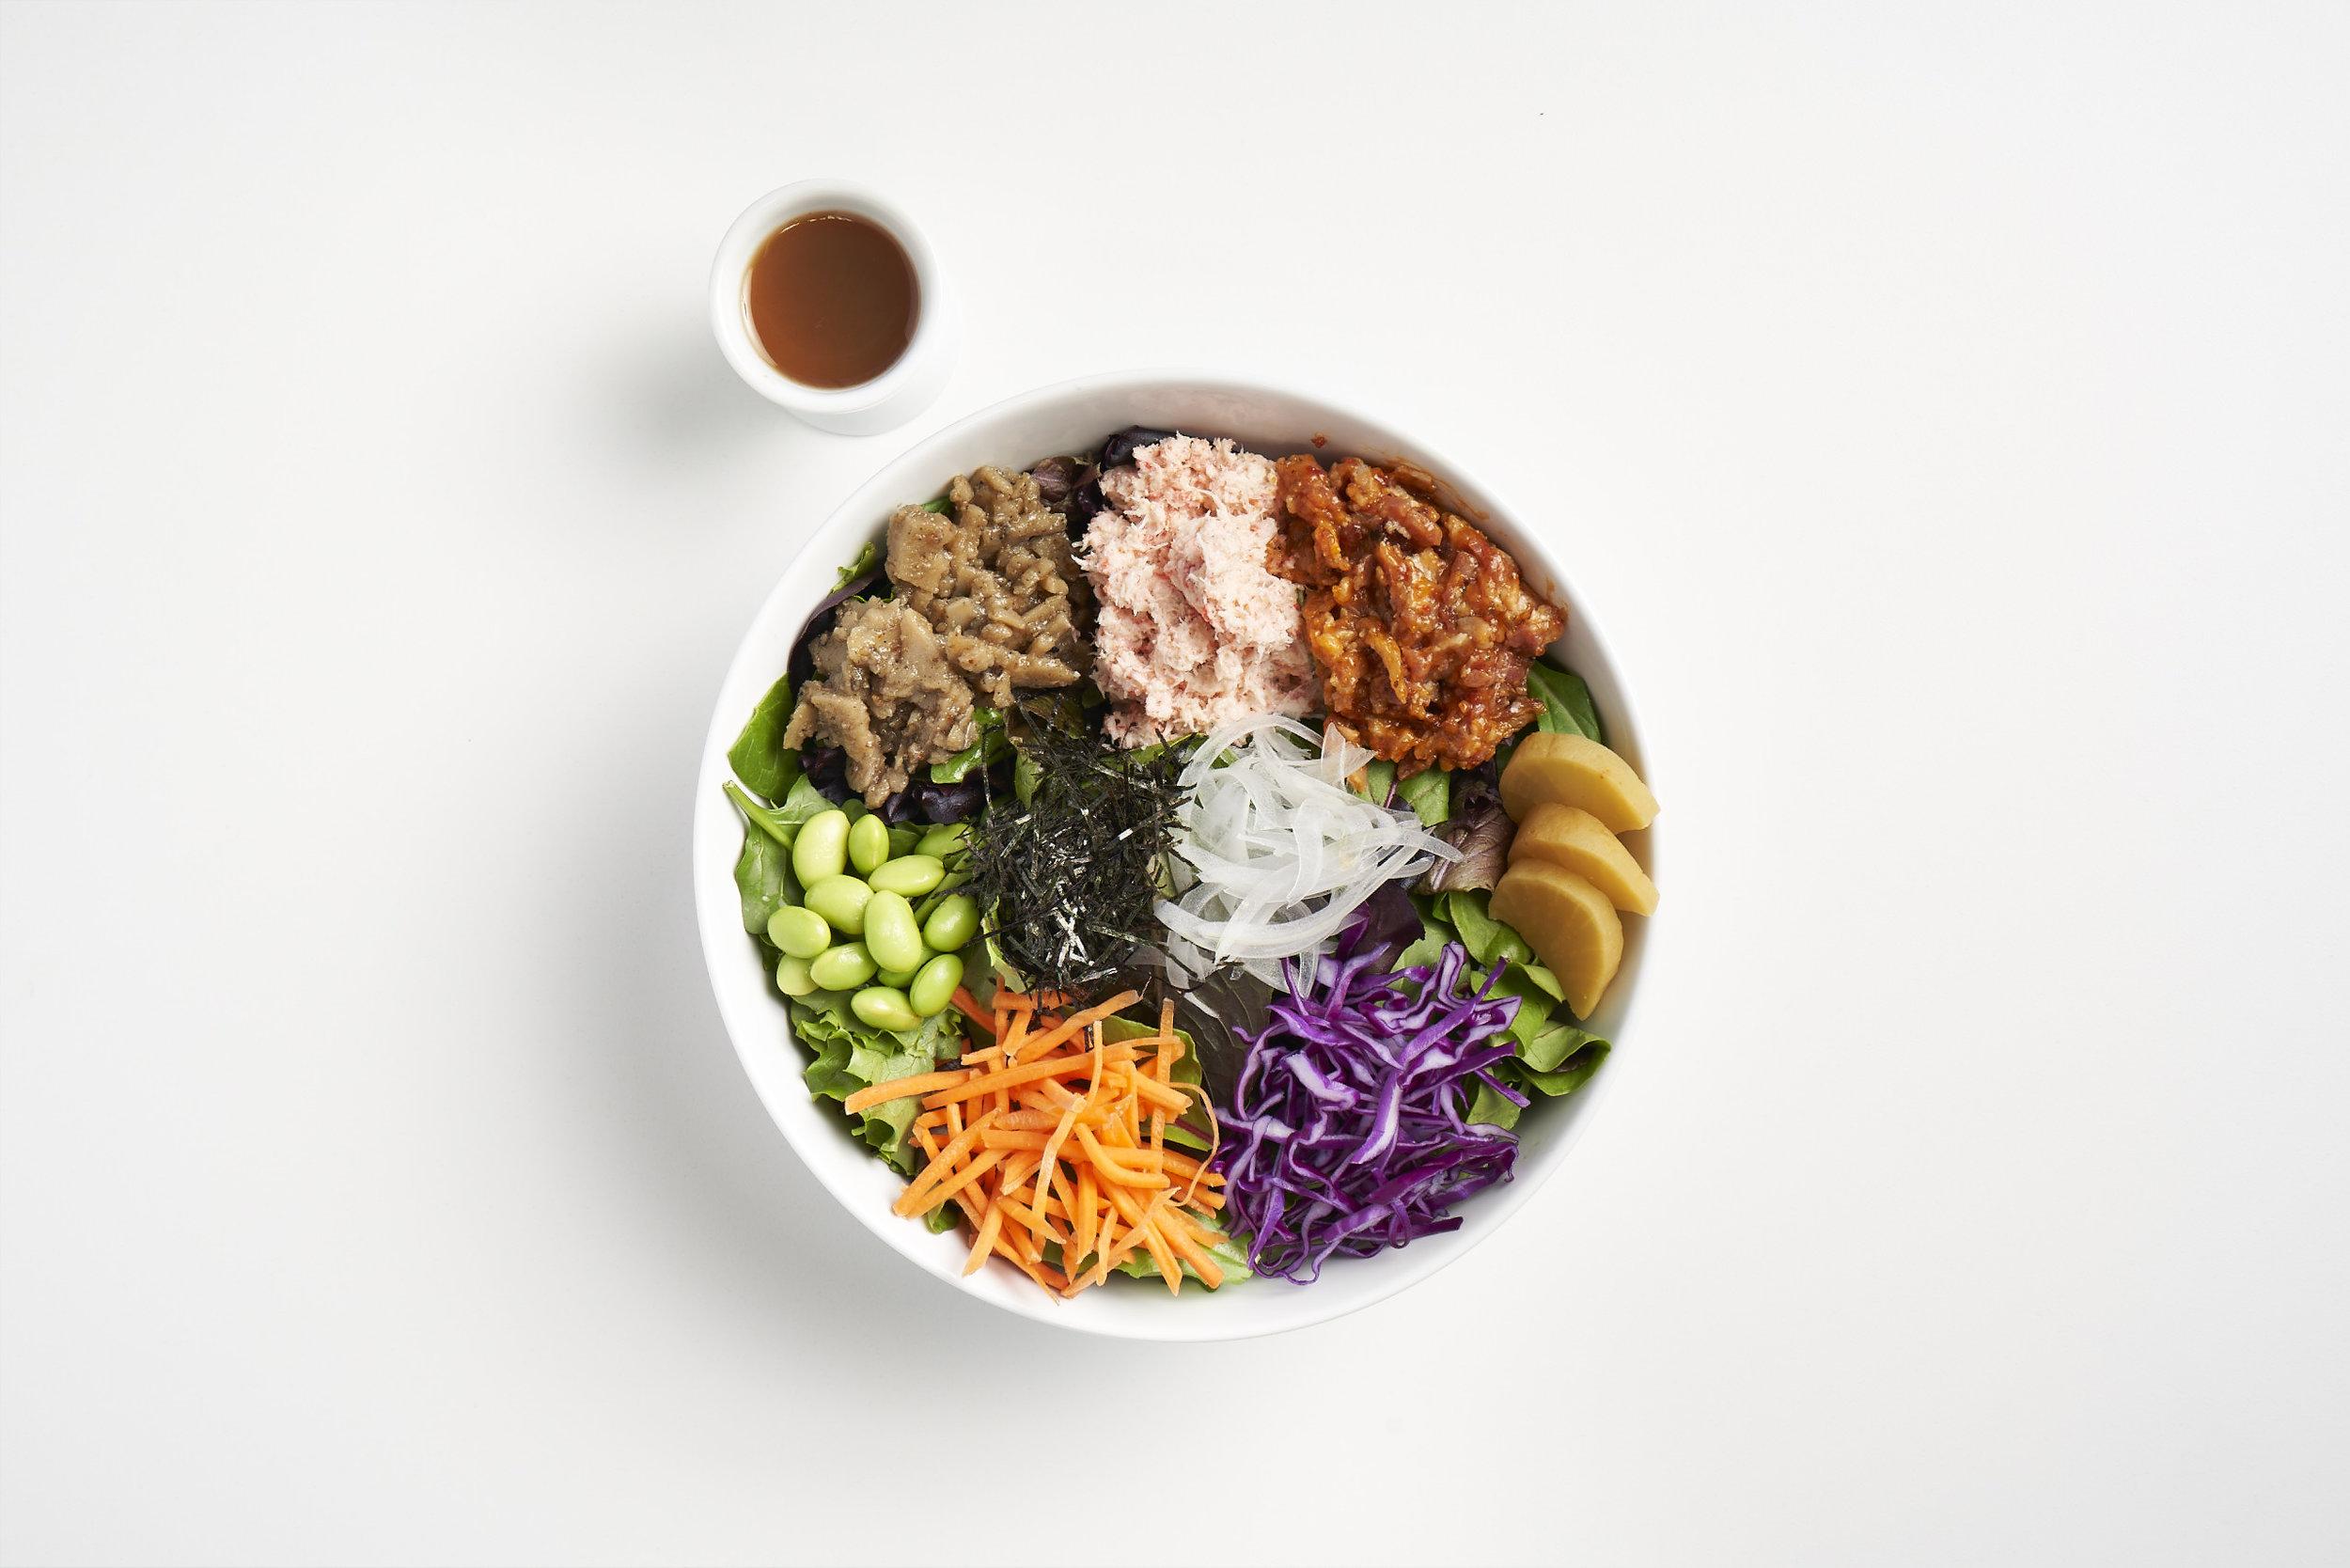 Onigilly_Bowl Salad Bowl.jpg